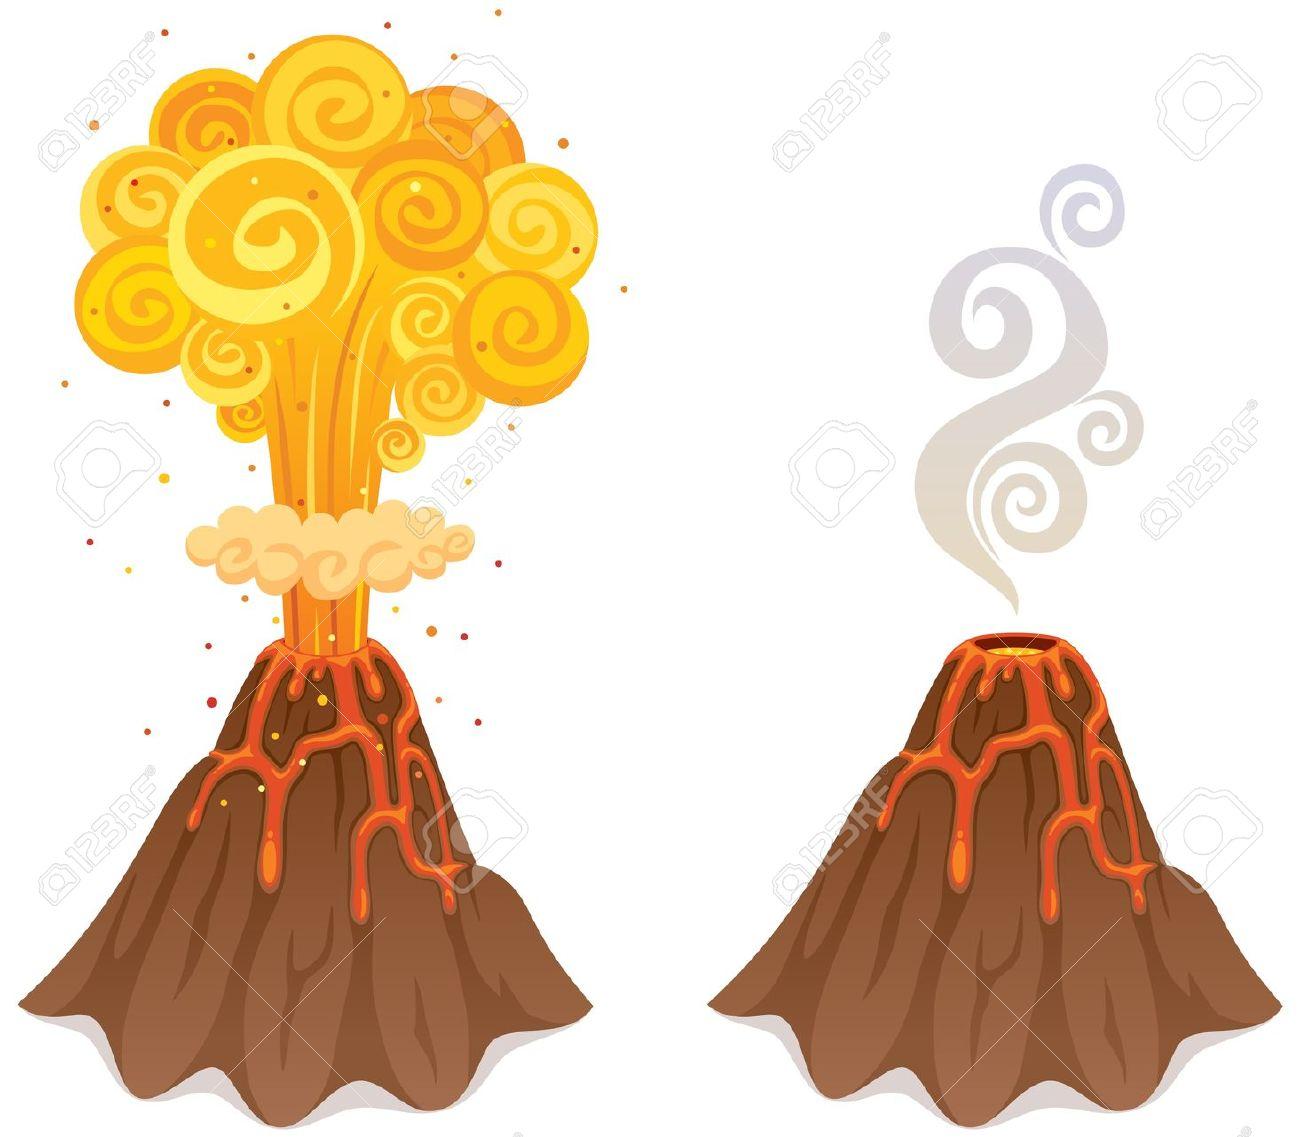 Brown clipart volcano Fans #11 volcano 71 clip